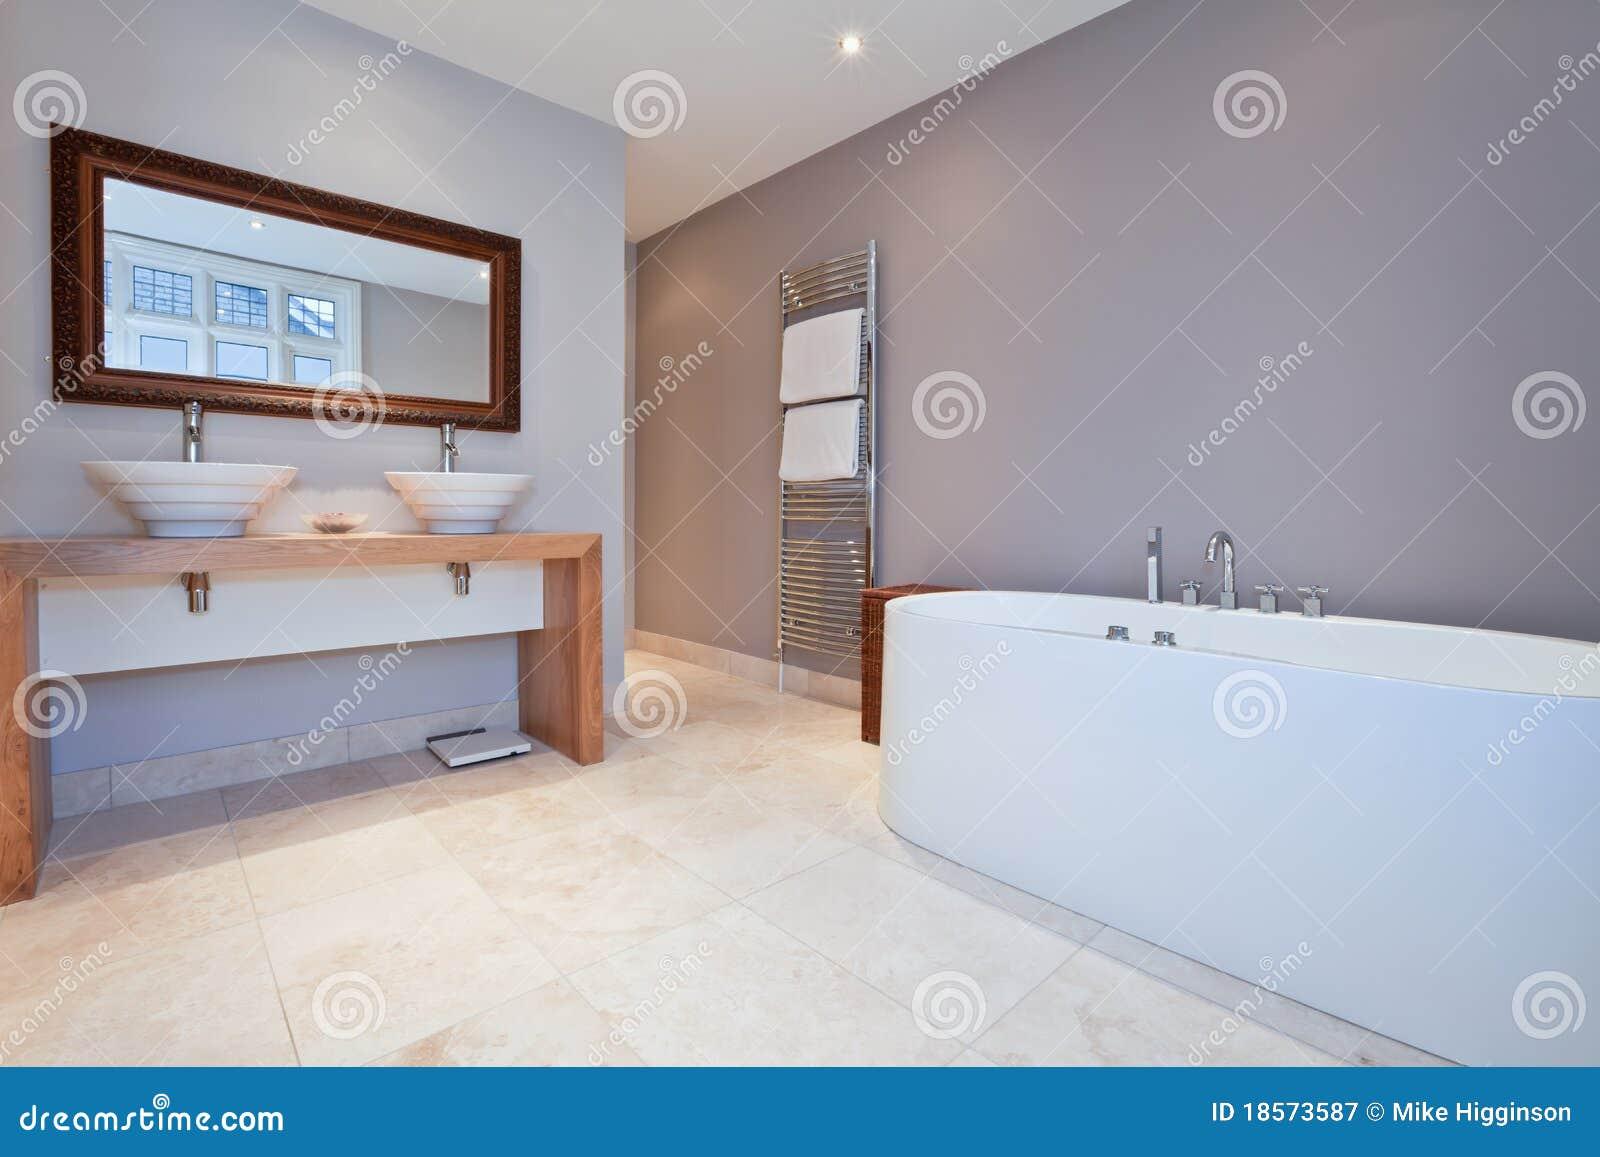 Mooie moderne badkamers royalty vrije stock fotografie afbeelding 18573587 - Mooie eigentijdse badkamer ...